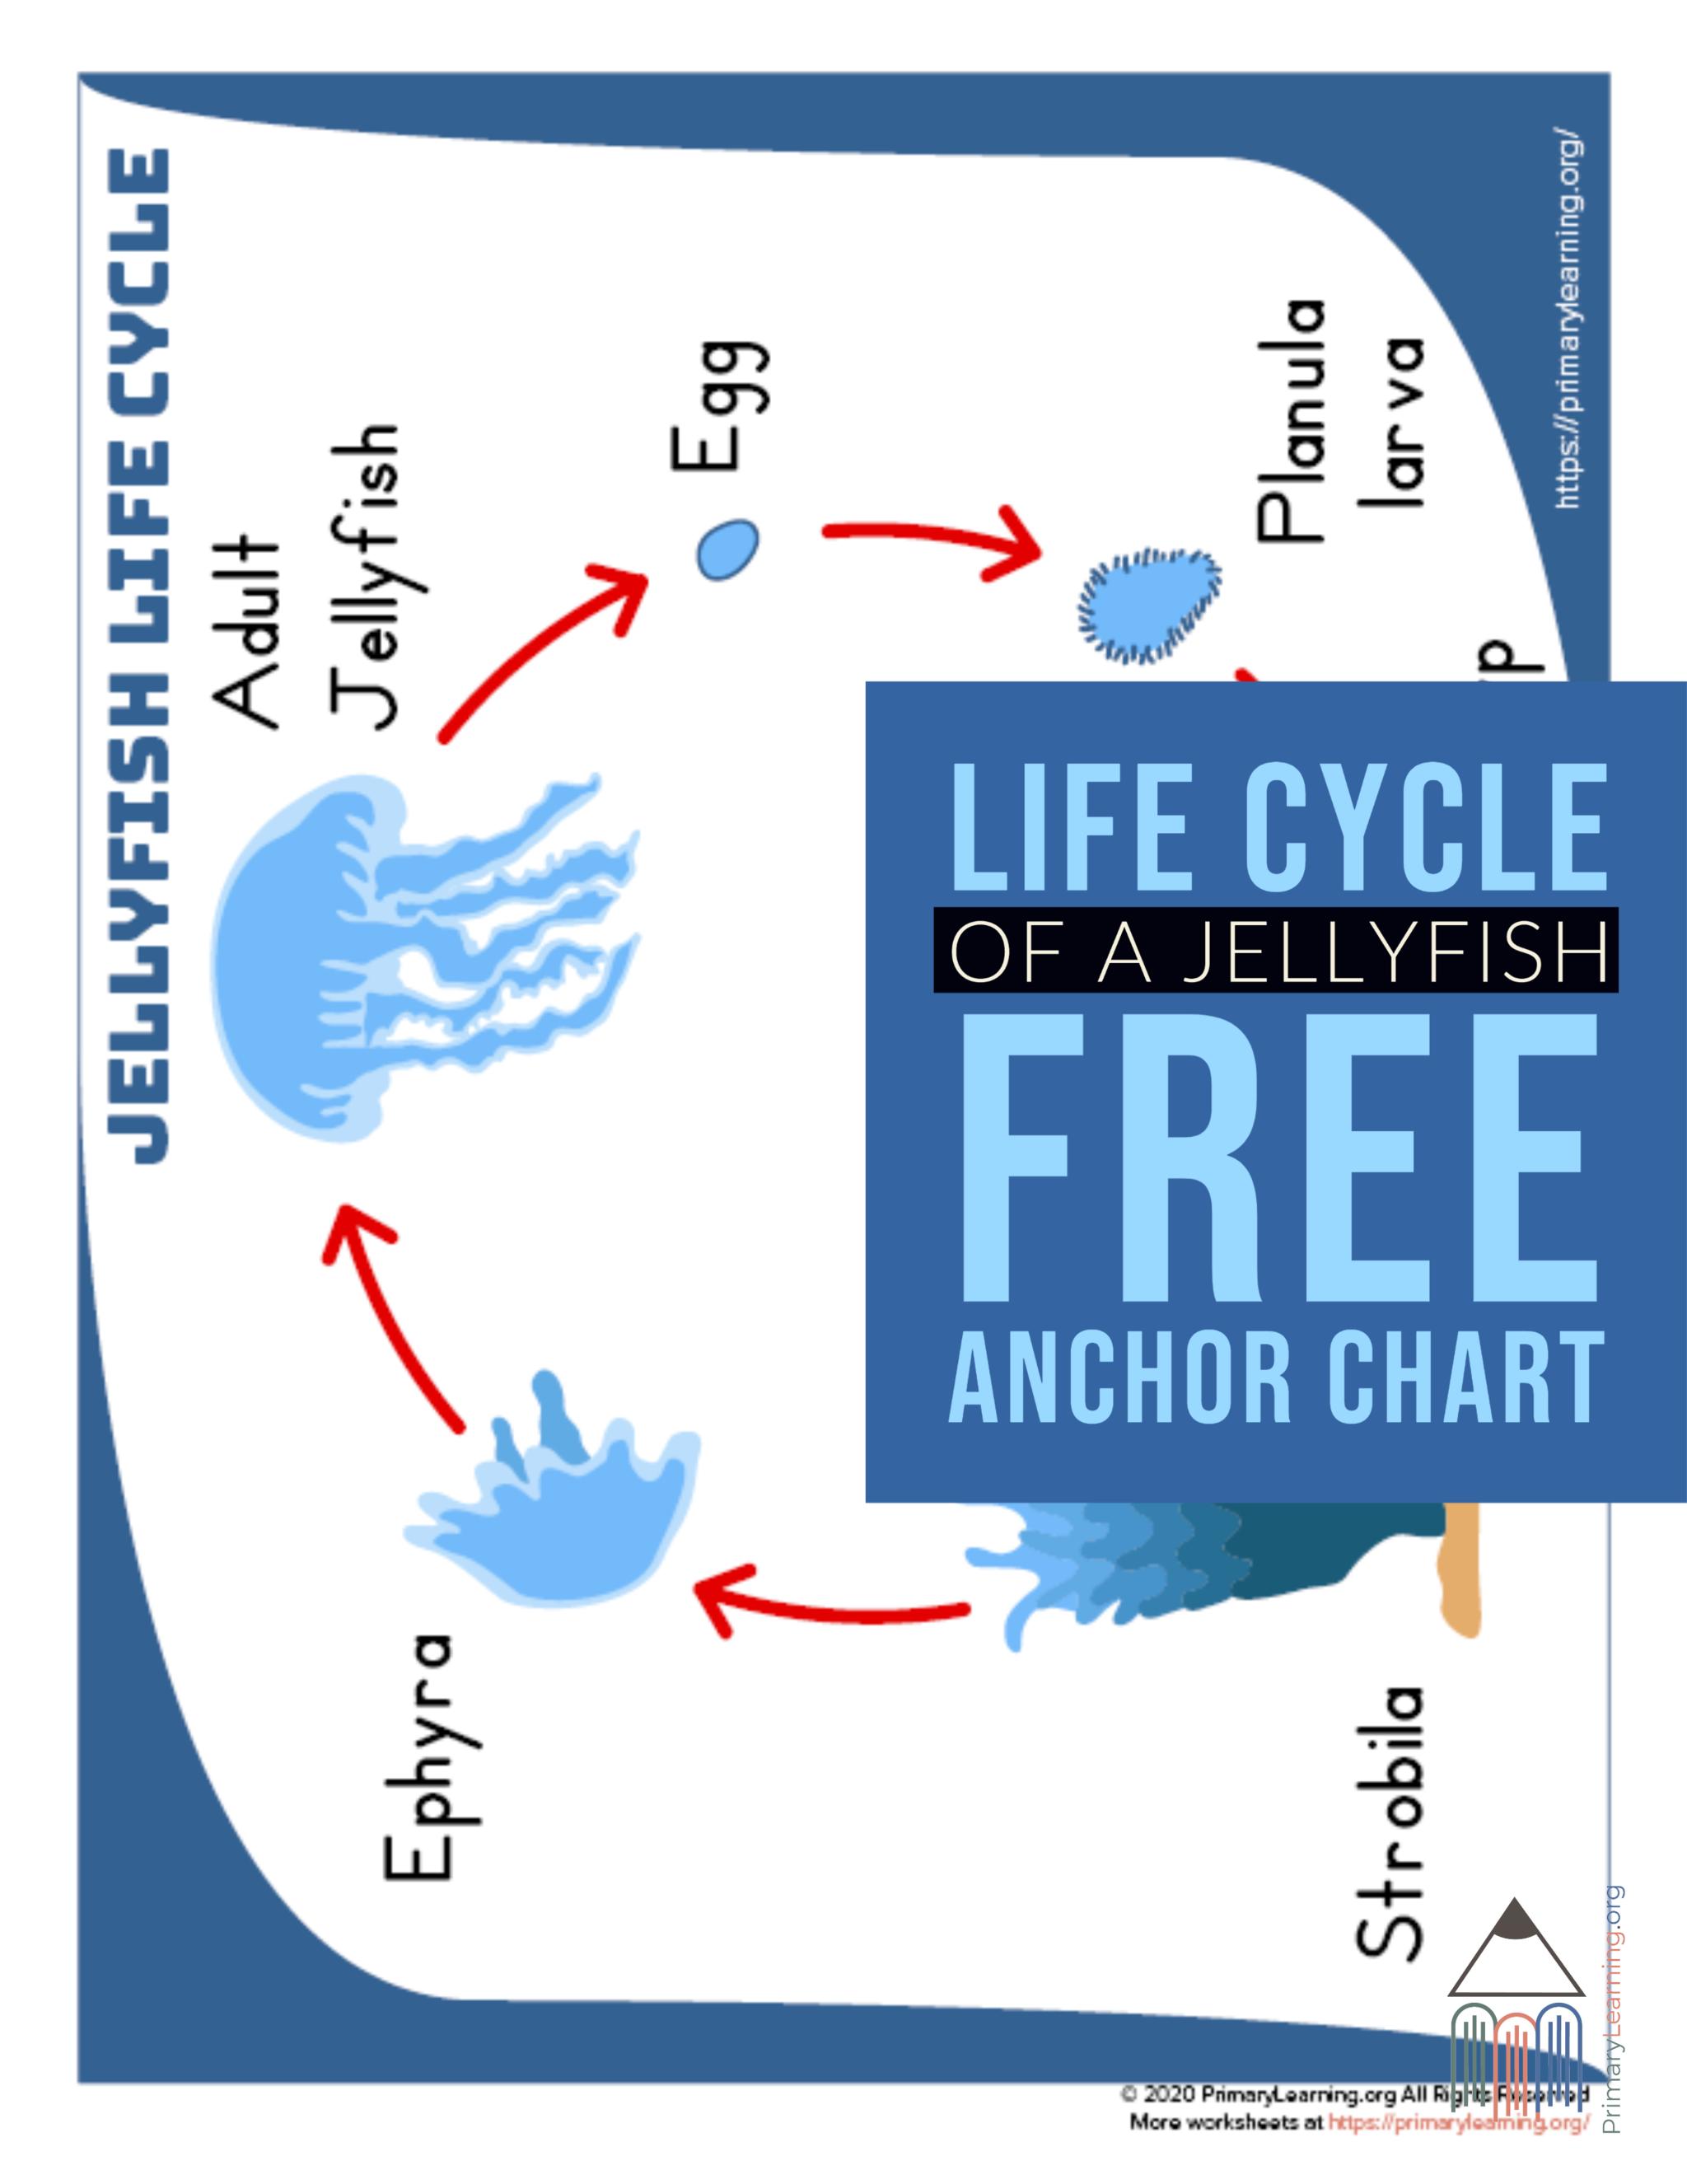 Jellyfish Life Cycle Anchor Chart